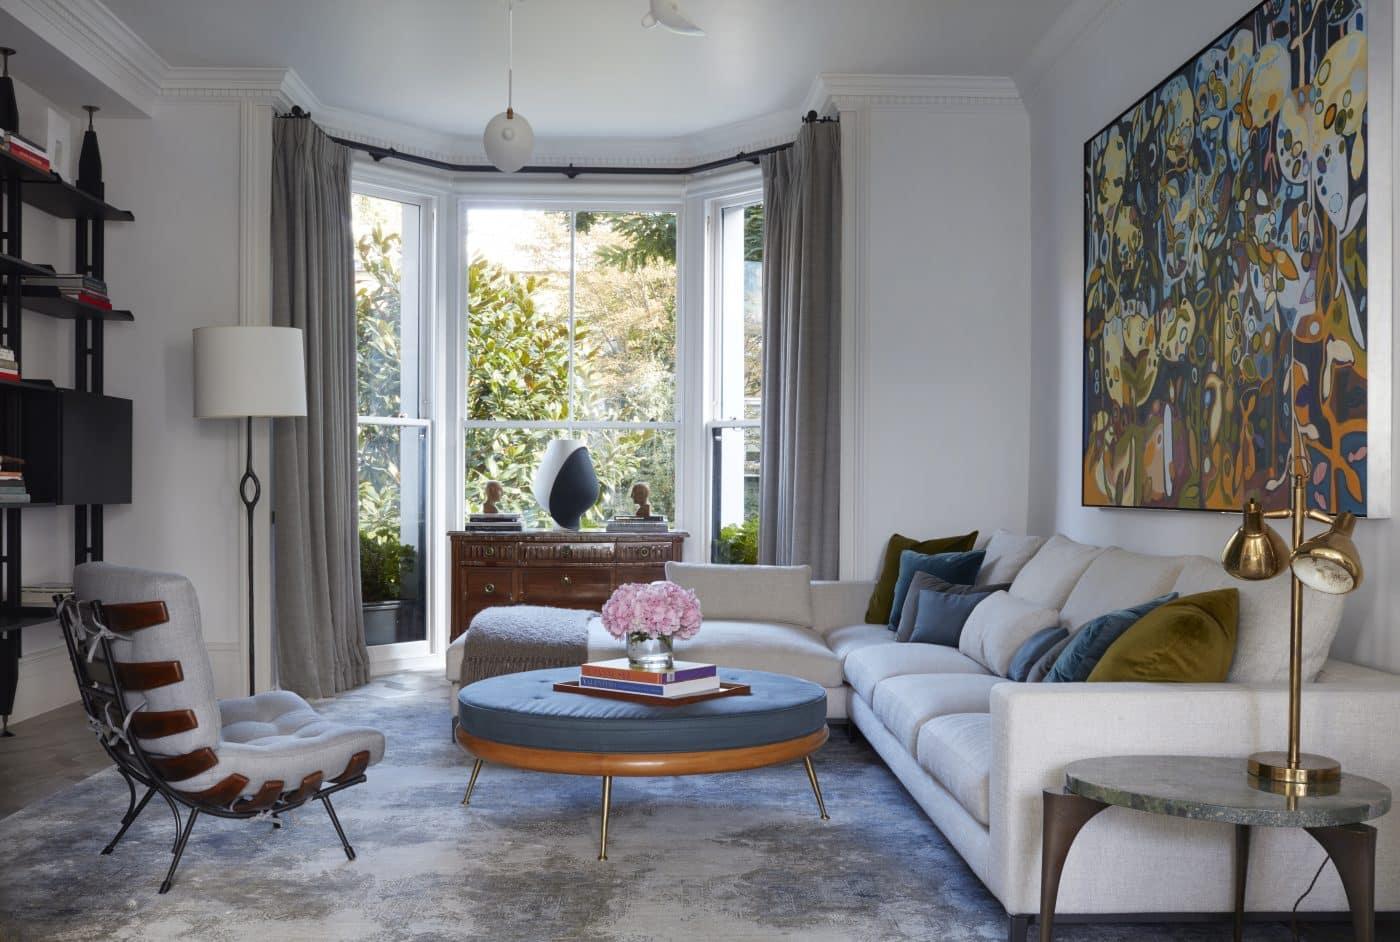 Holland Park living room